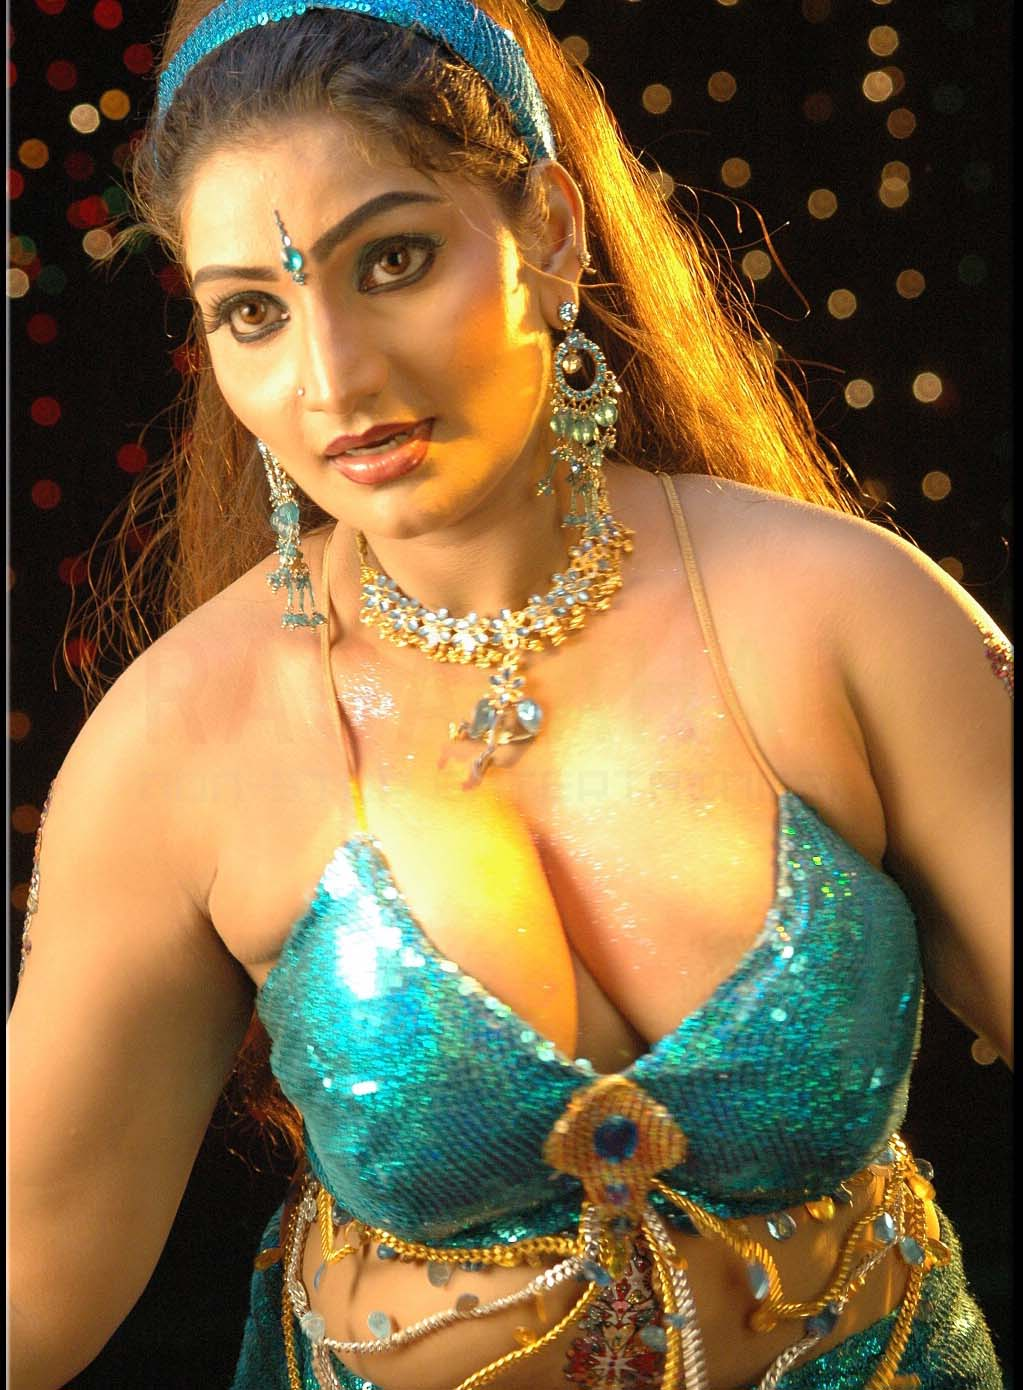 Couple nude girls boobs tamilnadu girl beautiful girl